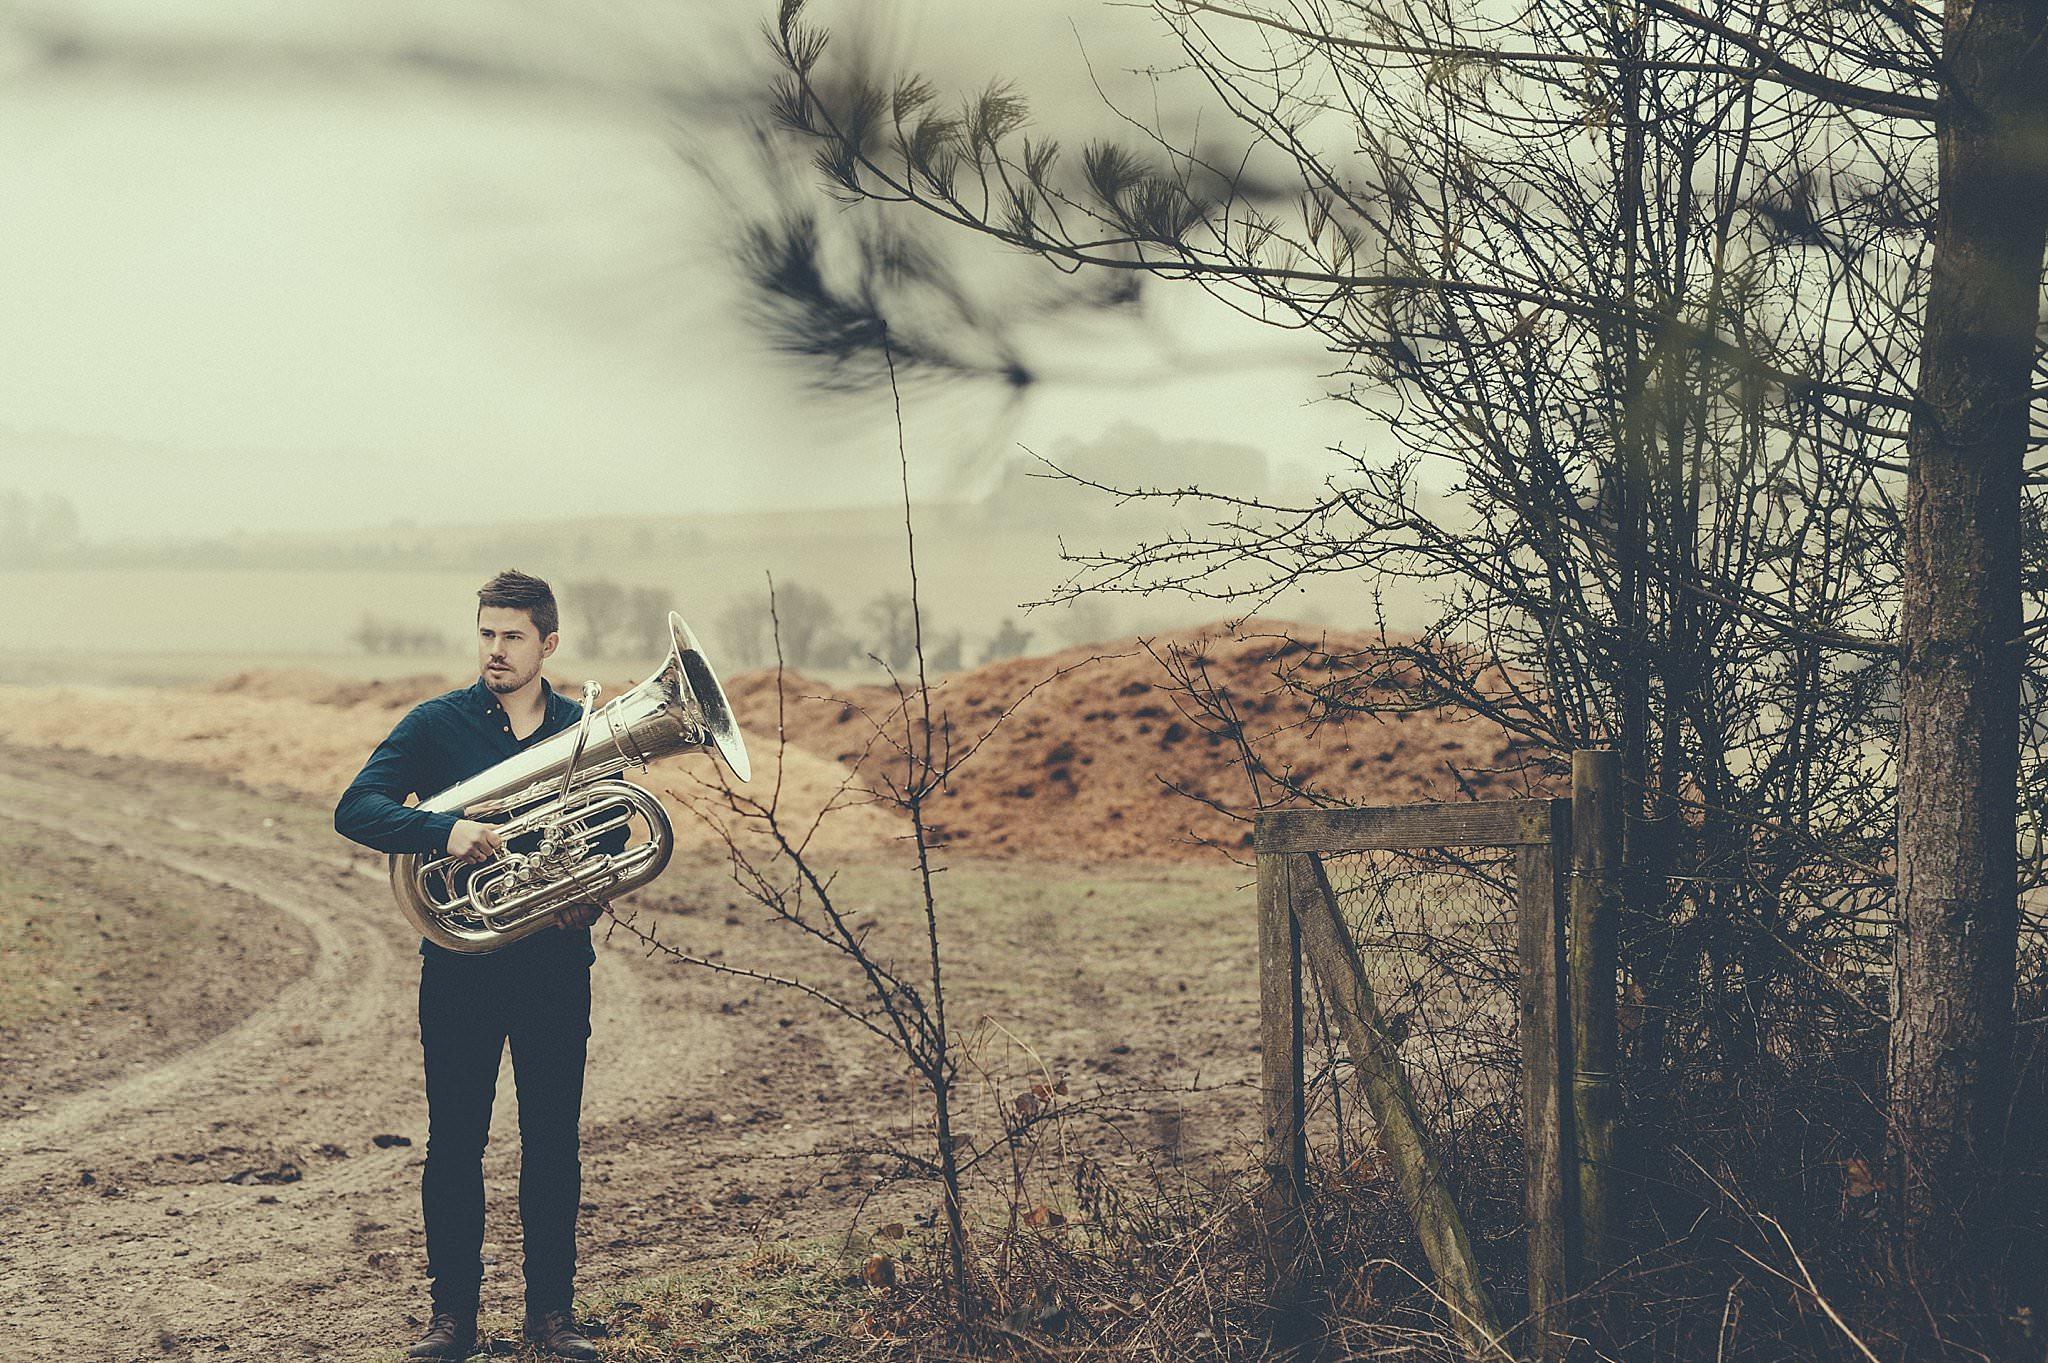 aga-tomaszek-music-photographer-cardiff_1307